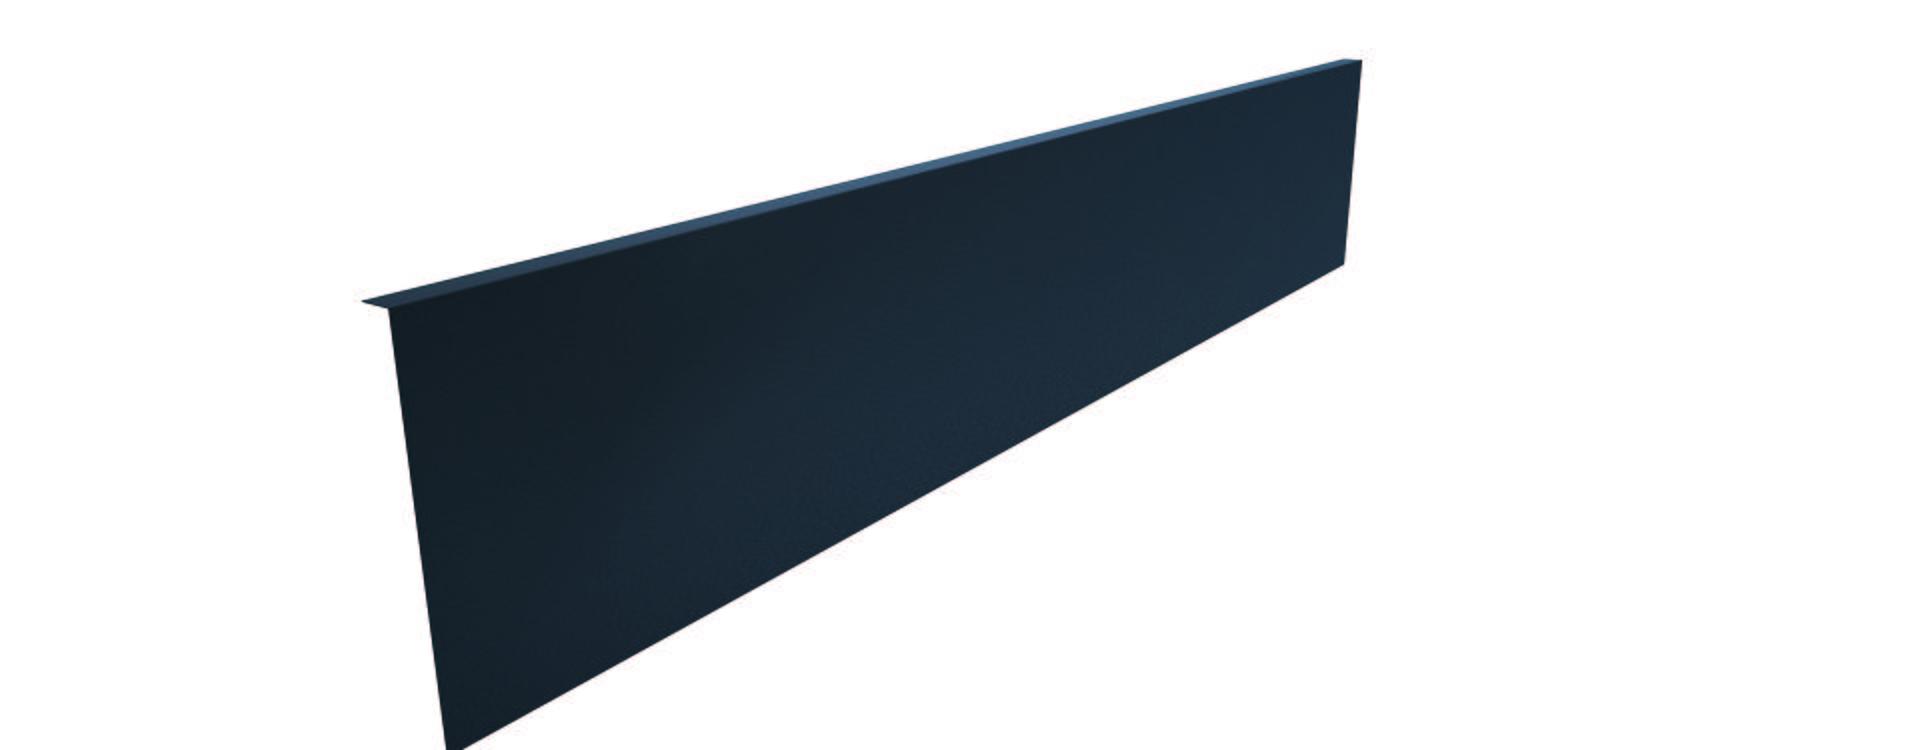 Small sub-ridge